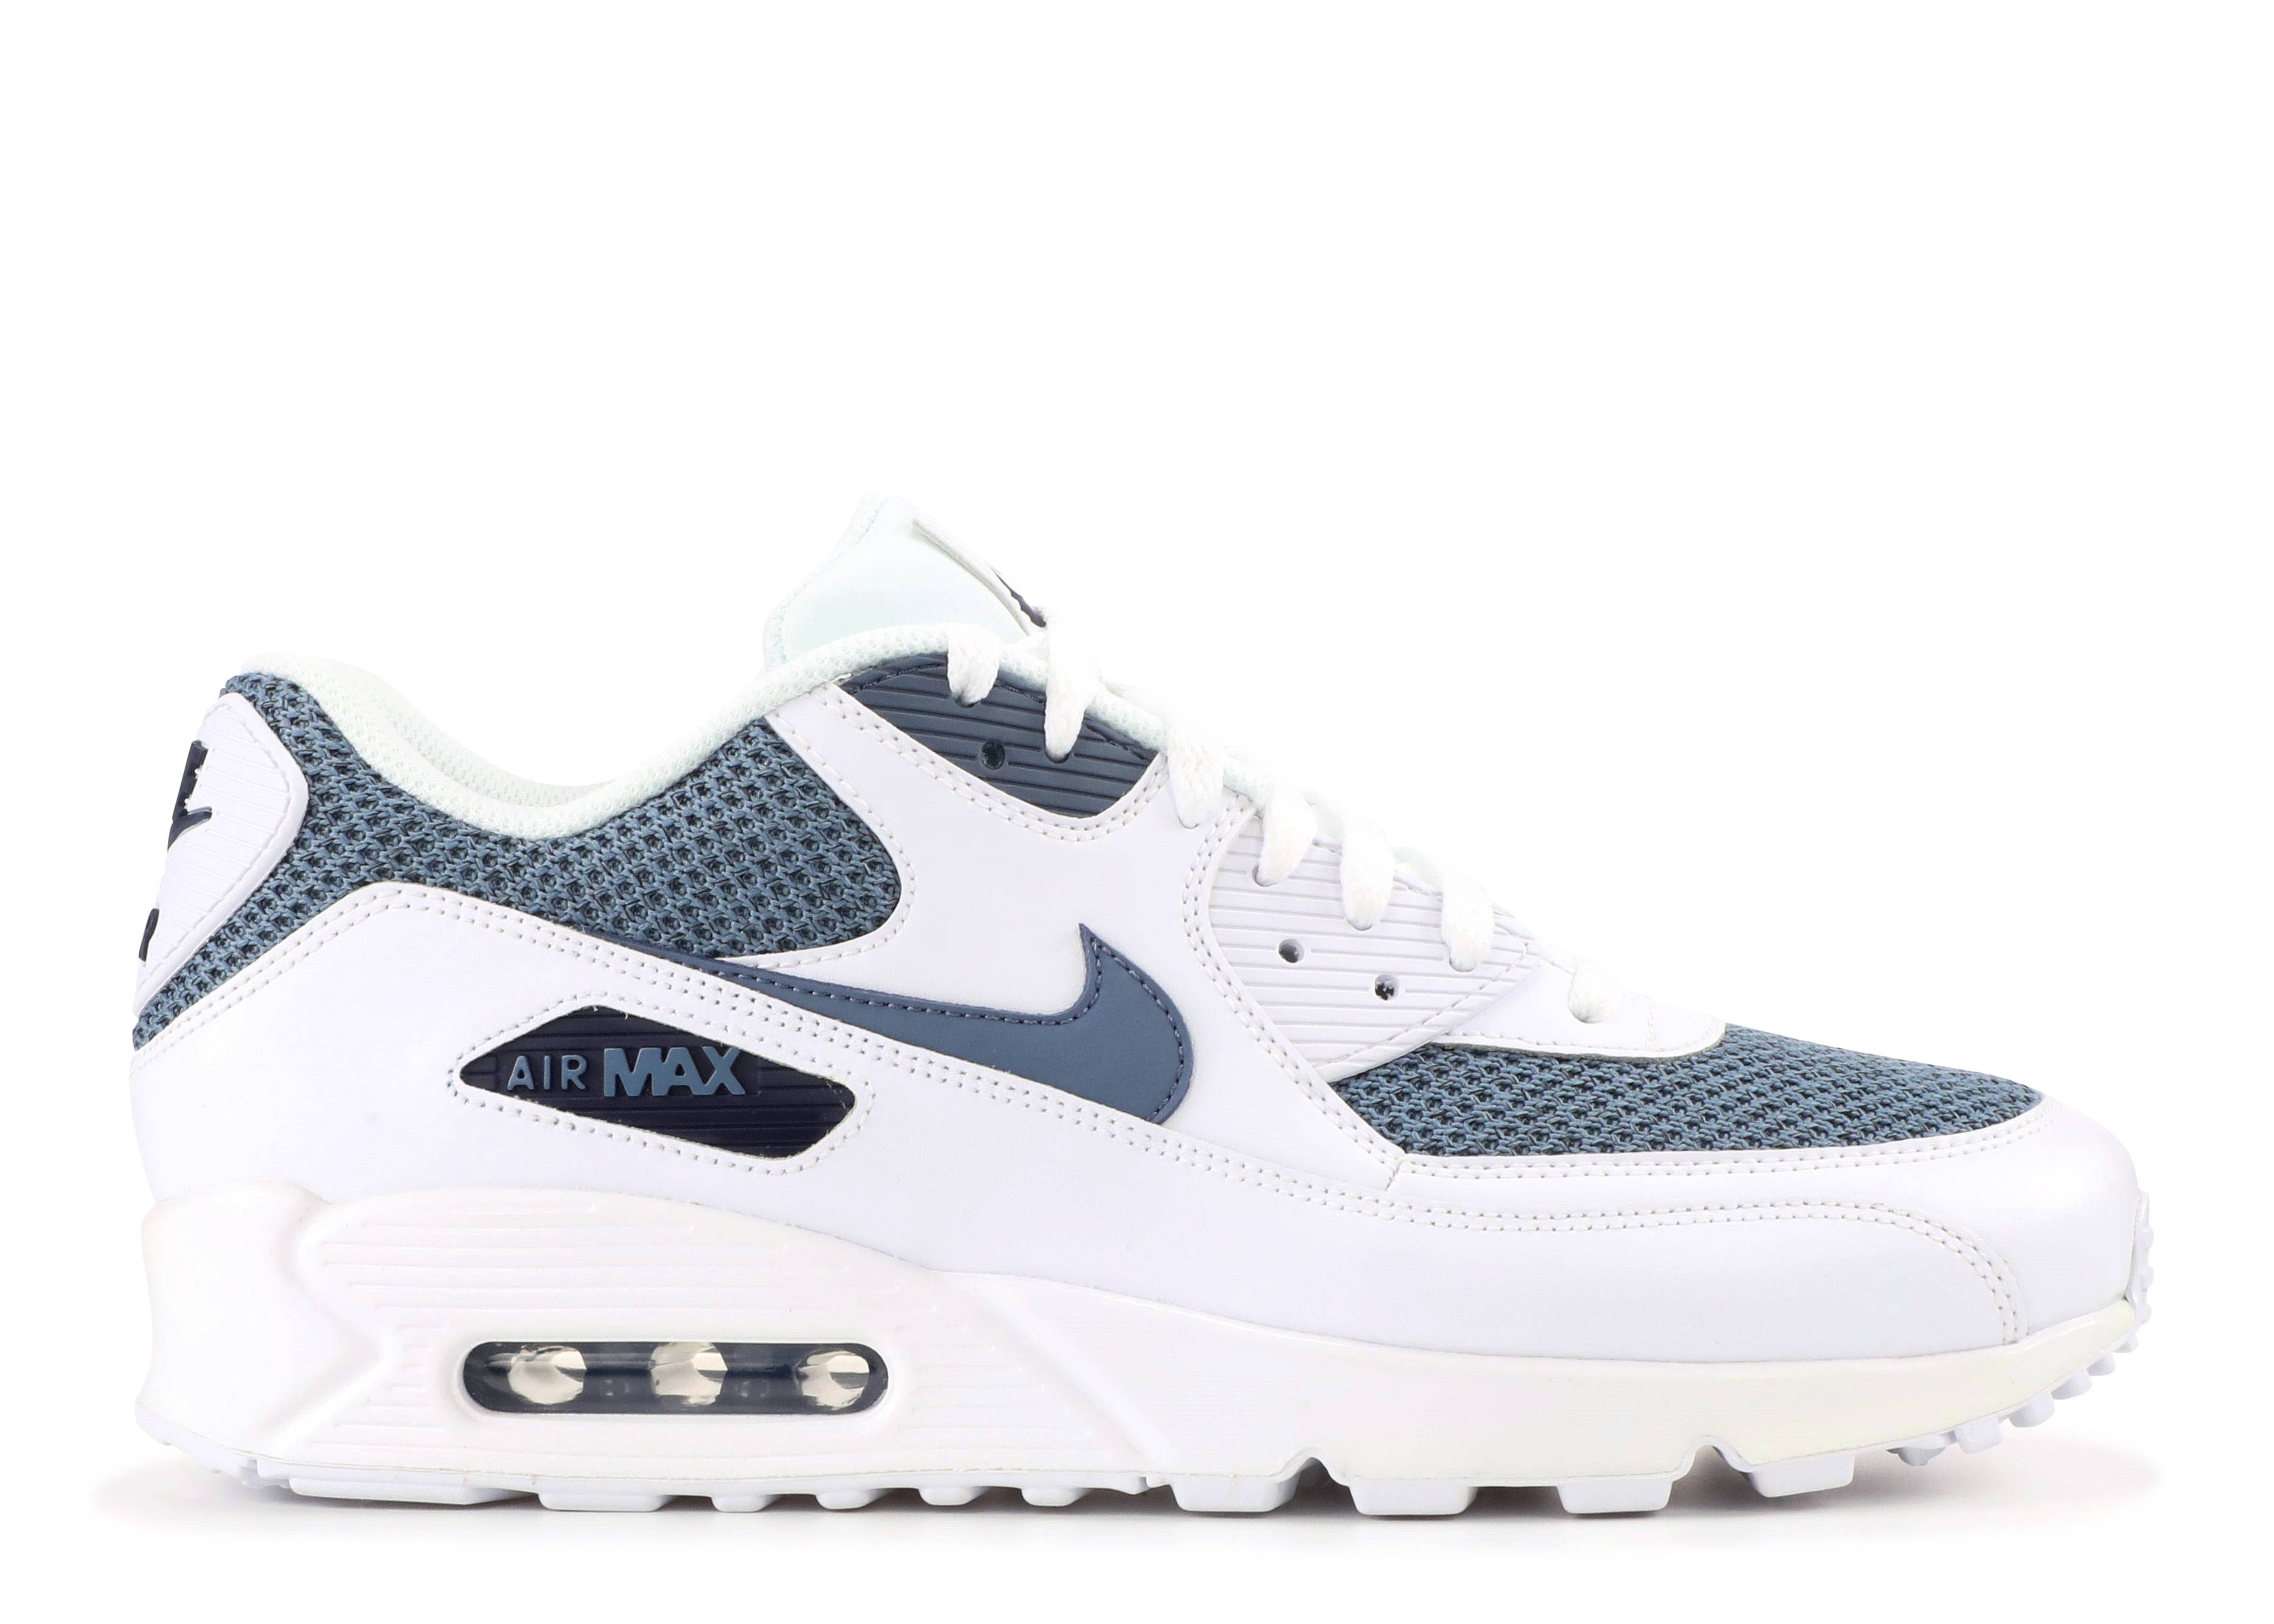 competitive price 8d027 7e6f8 NIKE AIR MAX 90 ESSENTIAL - Nike - 537384 133 - whitearmory blue-armory  blue  Flight Club